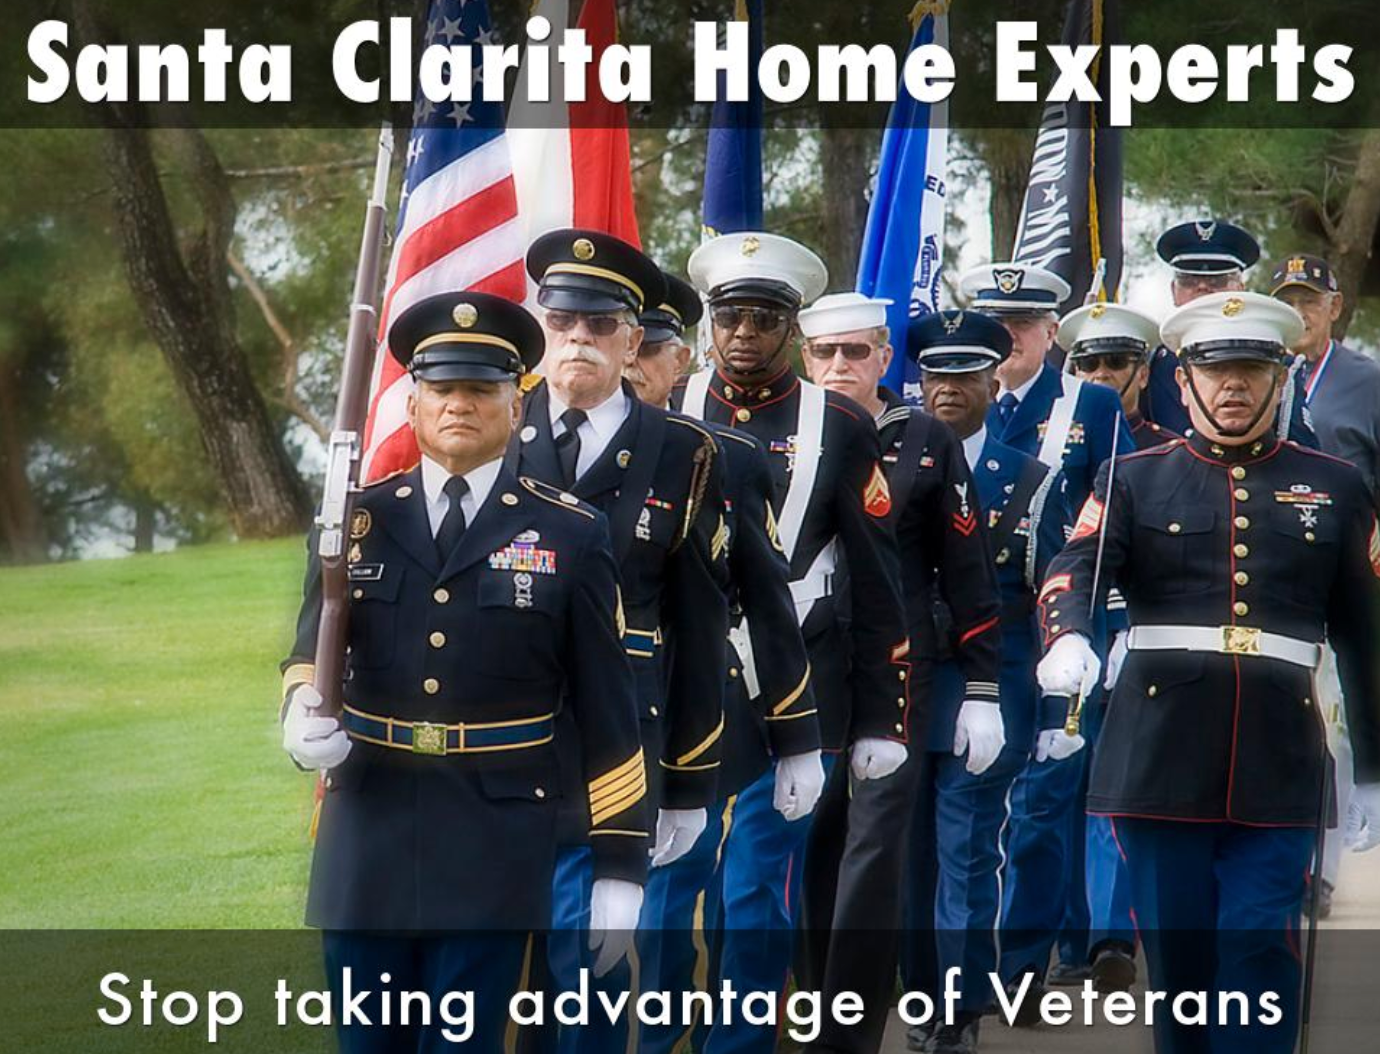 Santa Clarita home experts veterans are honored not screwed